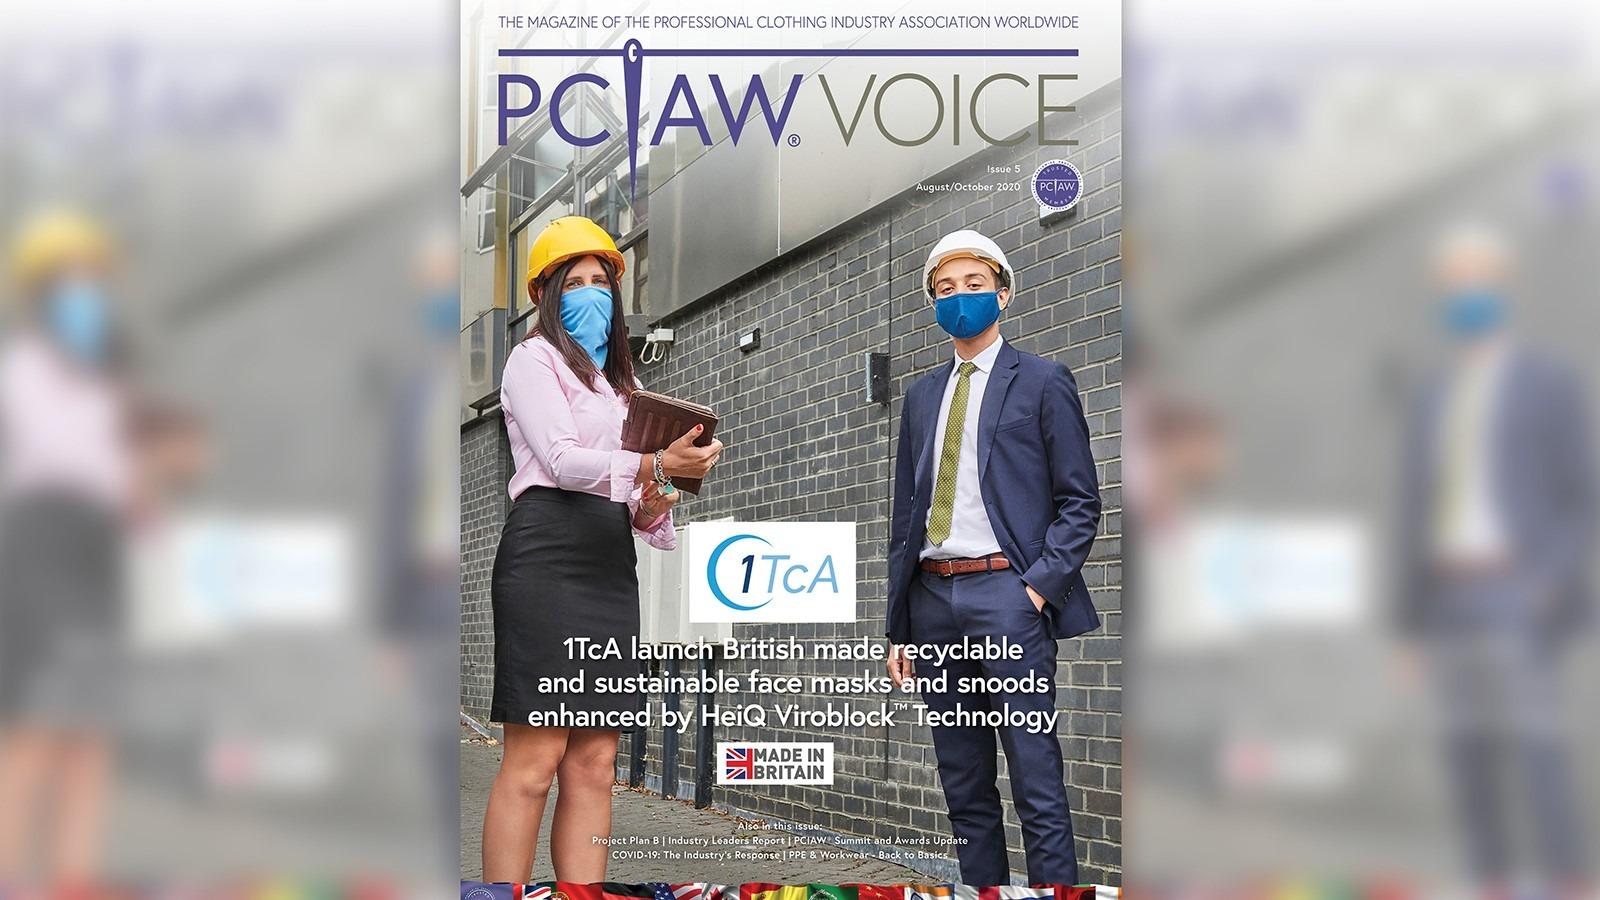 PCIAW® Voice